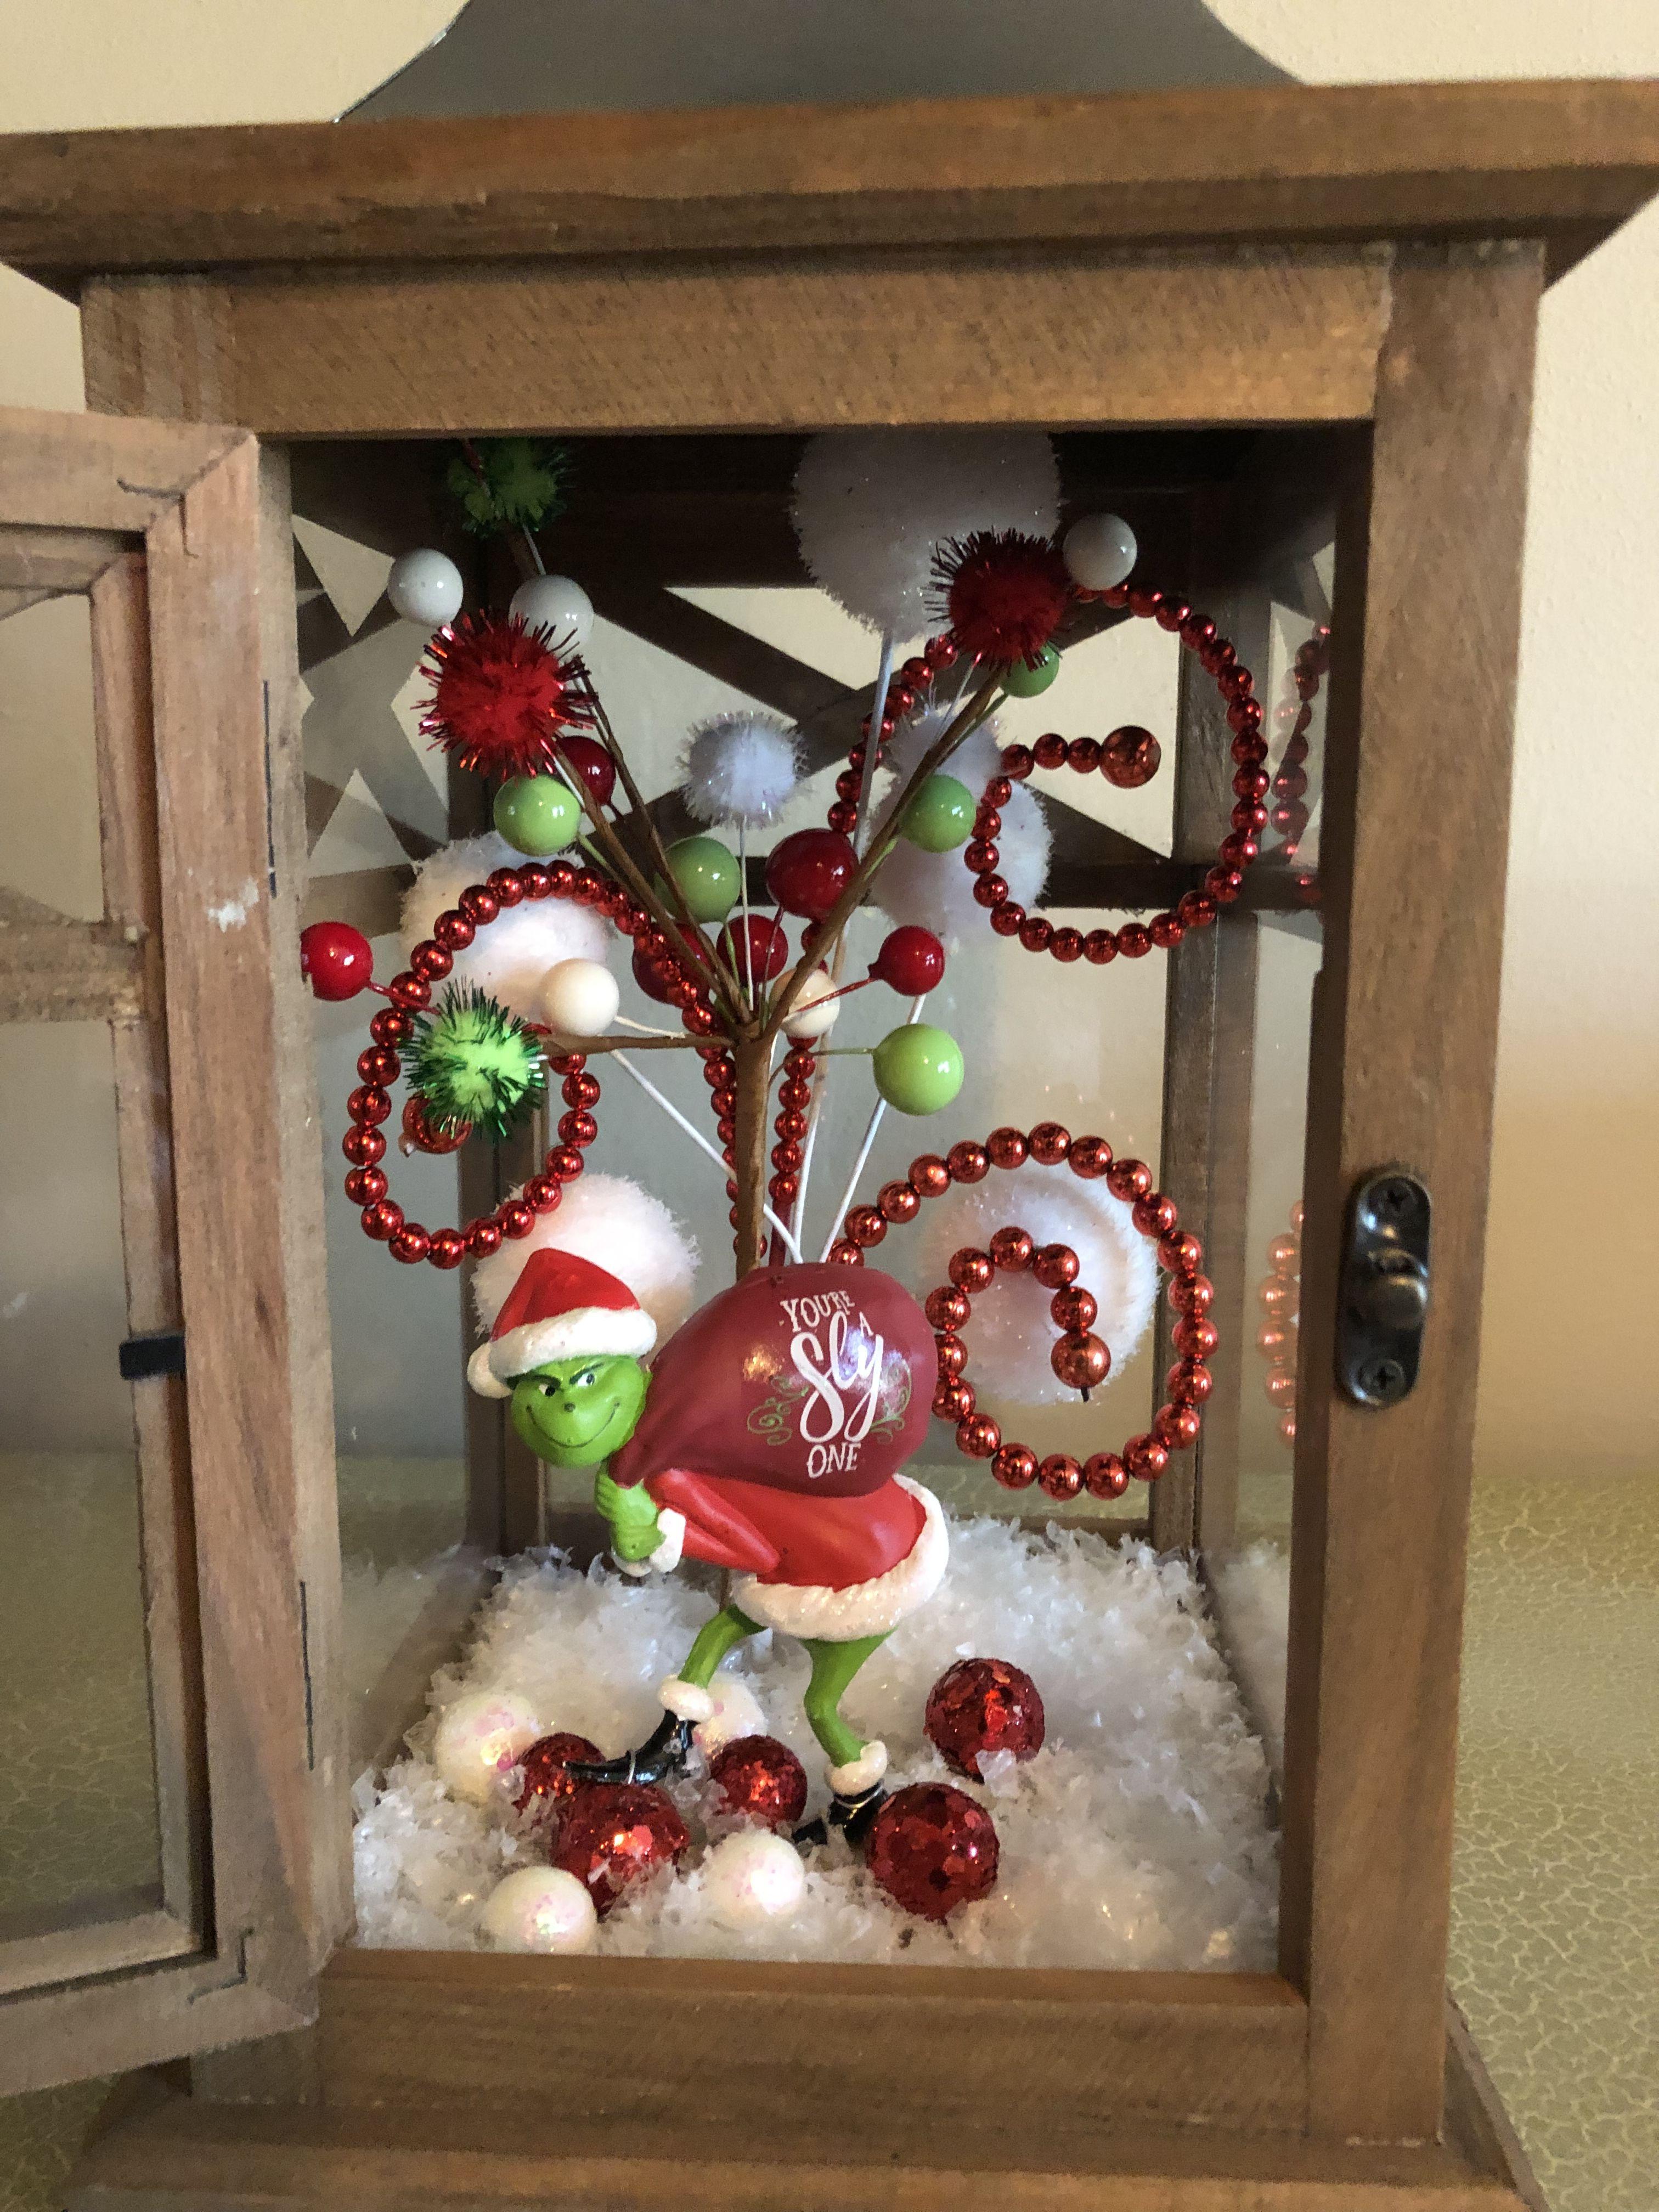 Grinch Christmas Wreaths Ornament Wreath Holiday Decor